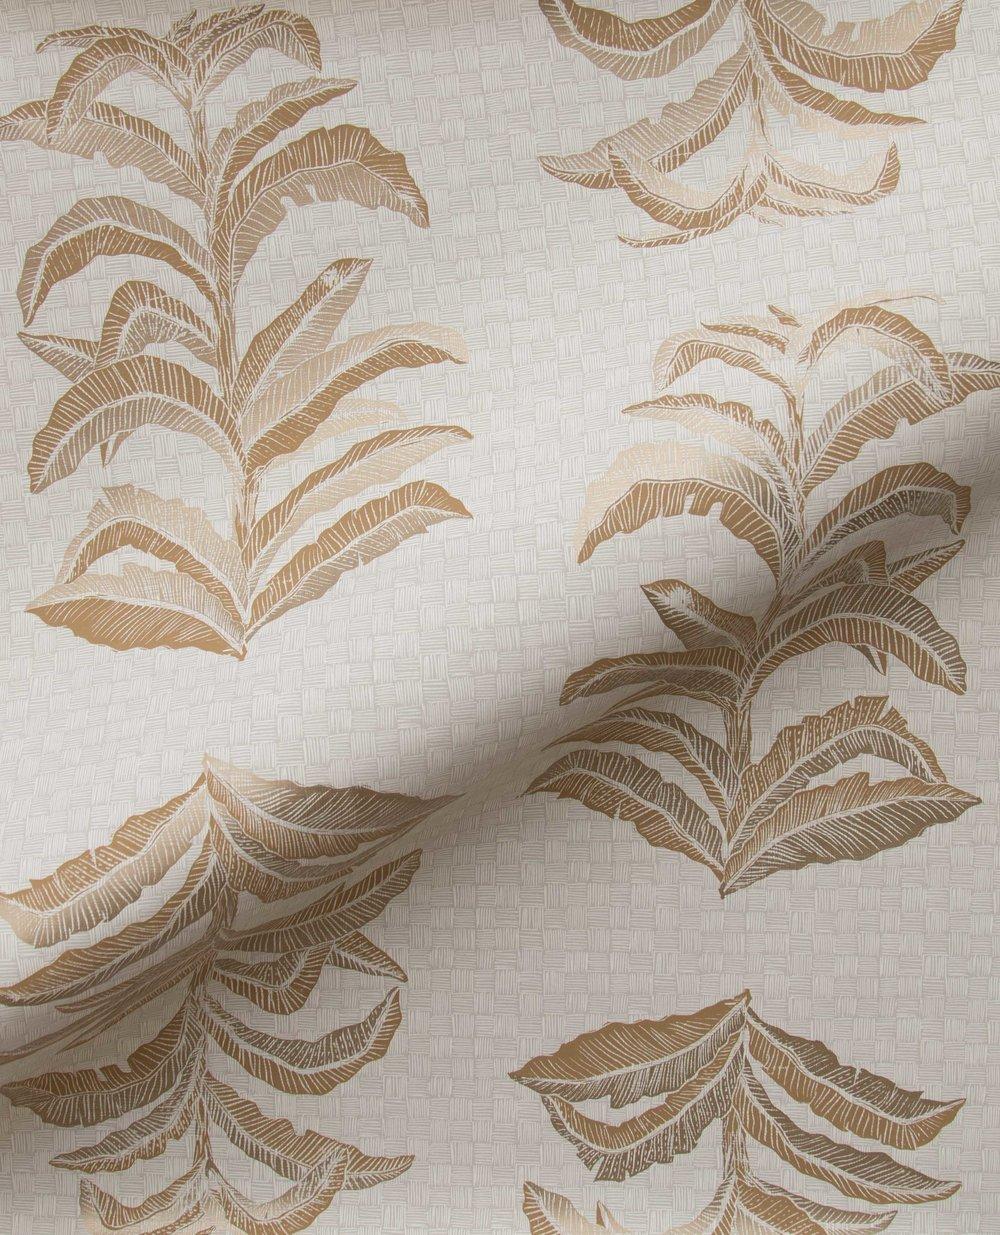 Krane Home_Banana Leaf Gold Wallpaper-3.jpeg